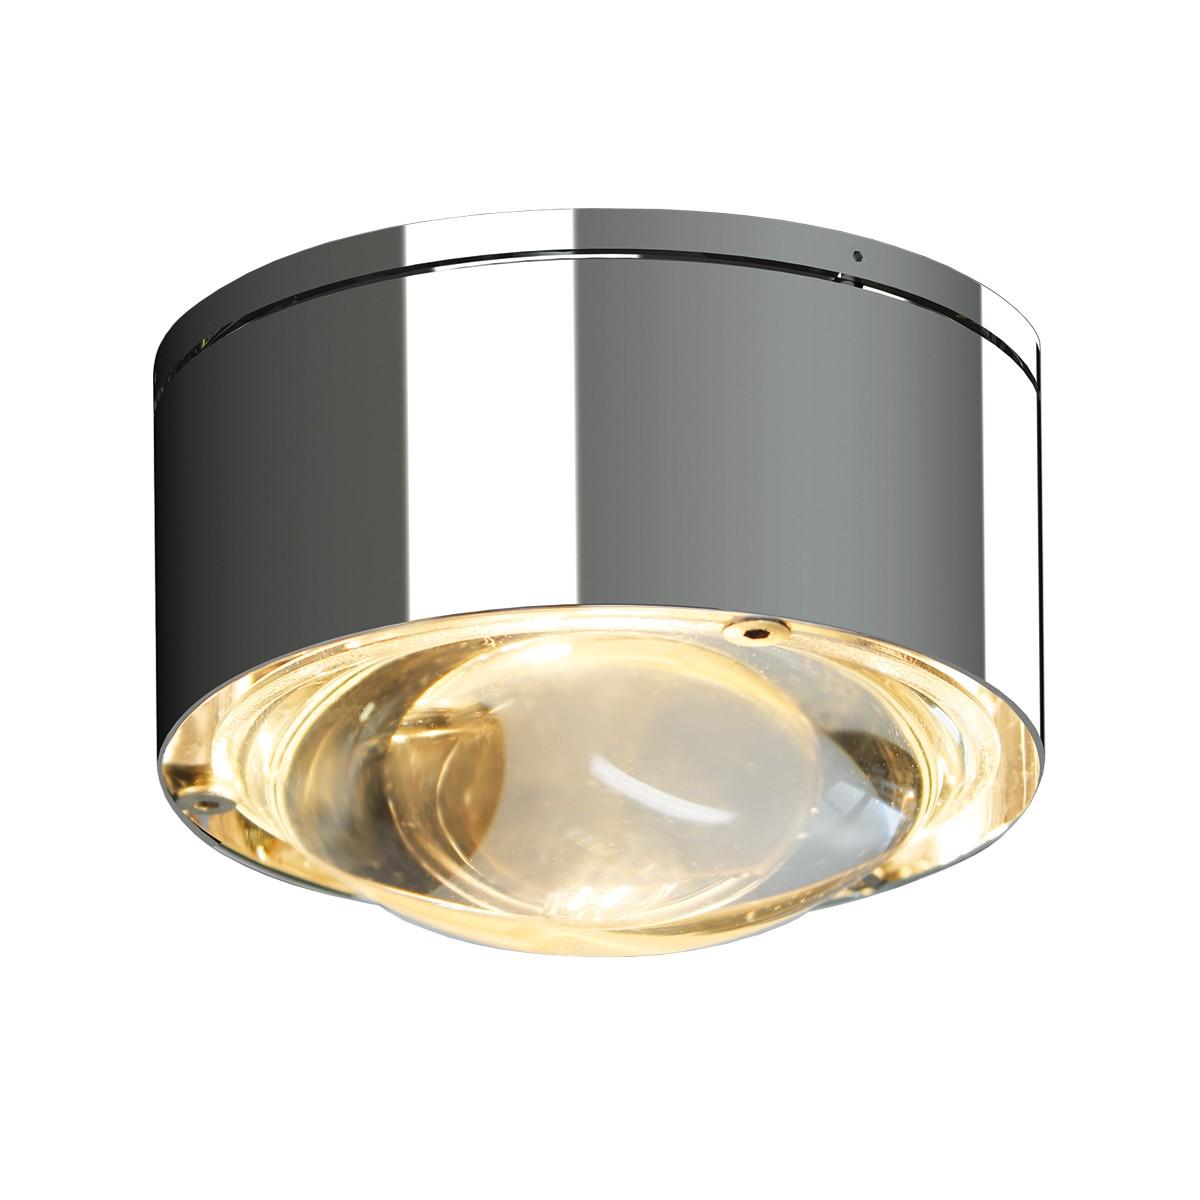 Top Light Puk Maxx One 2 LED Deckenleuchte, Chrom